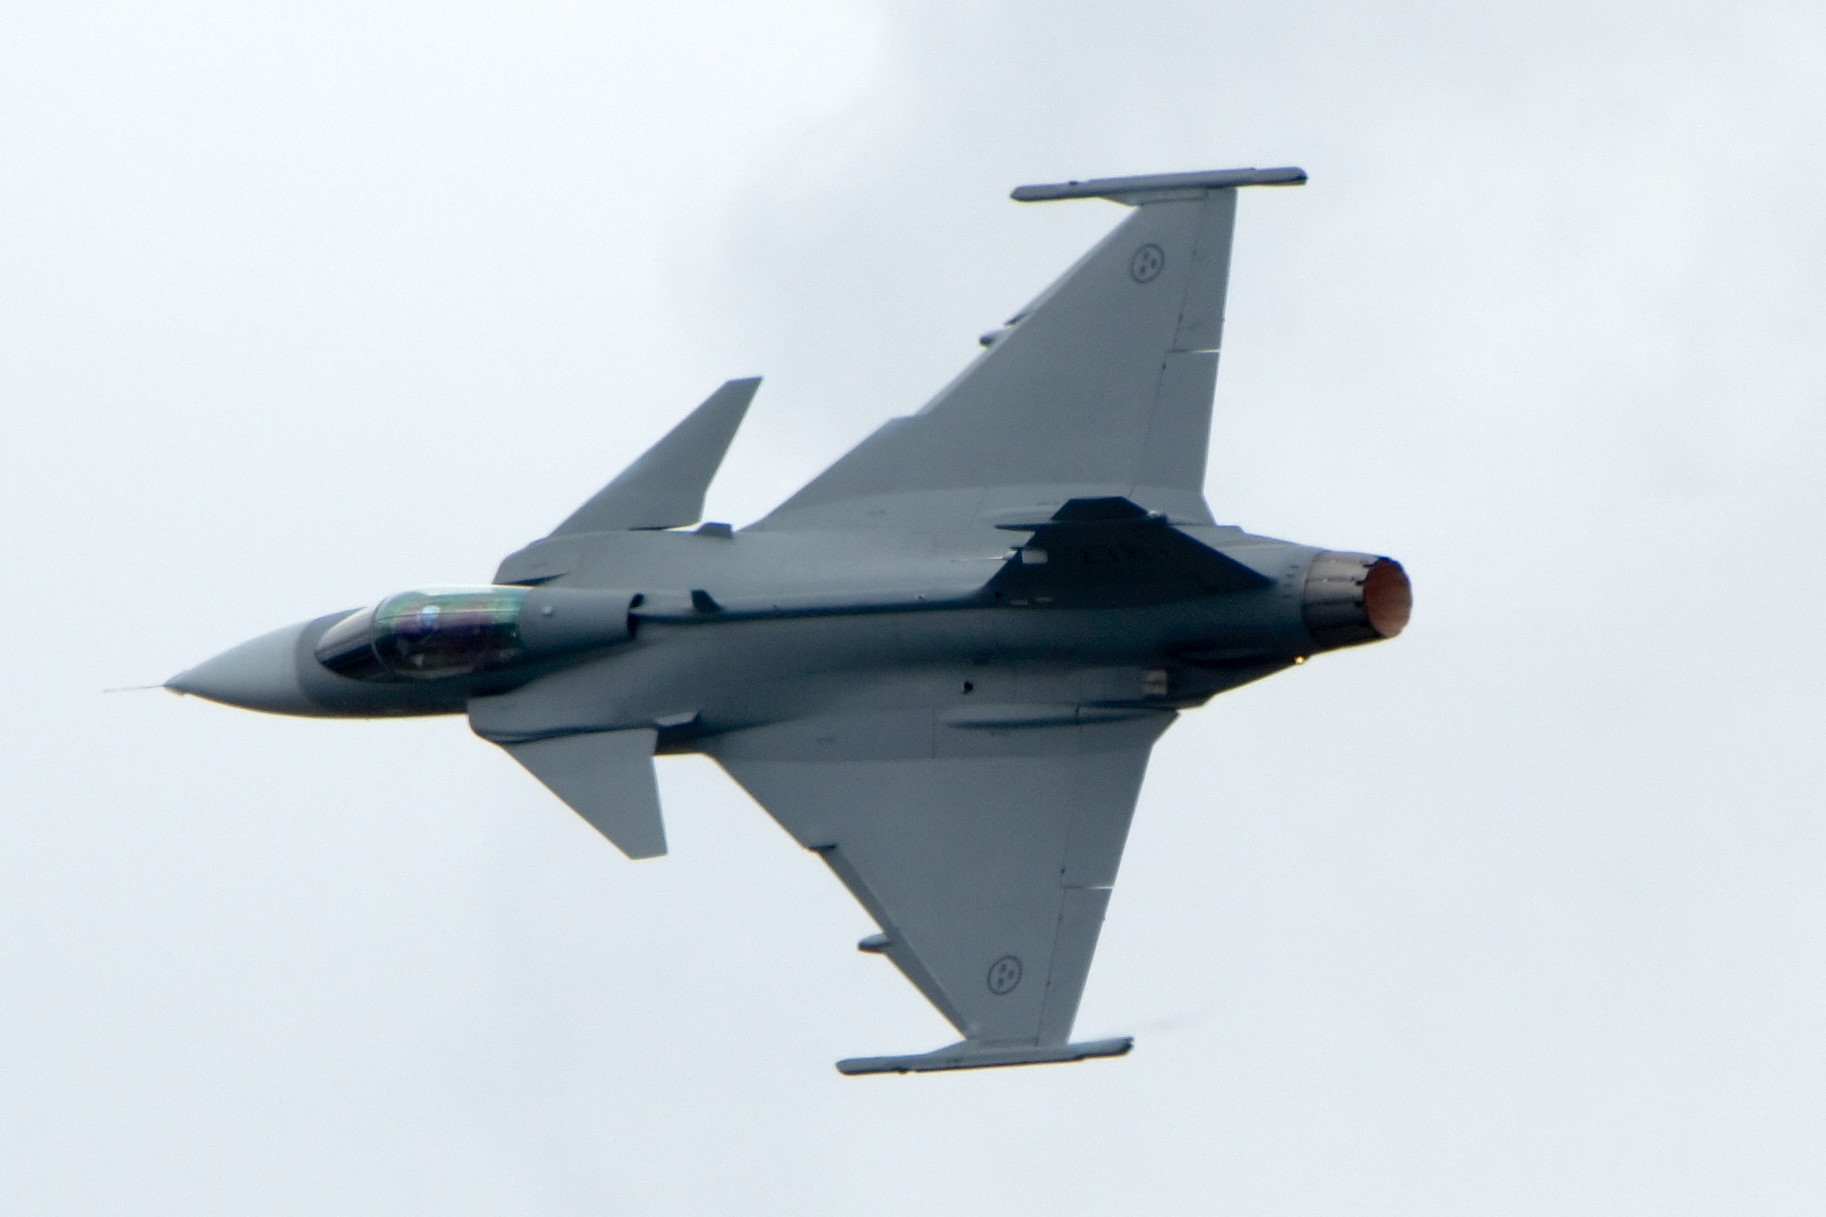 Истребитель Saab JAS 39E Gripen http://en.wikipedia.org/wiki/Saab_JAS_39_Gripen - Швейцария отказалась от покупки истребителей Gripen  | Военно-исторический портал Warspot.ru